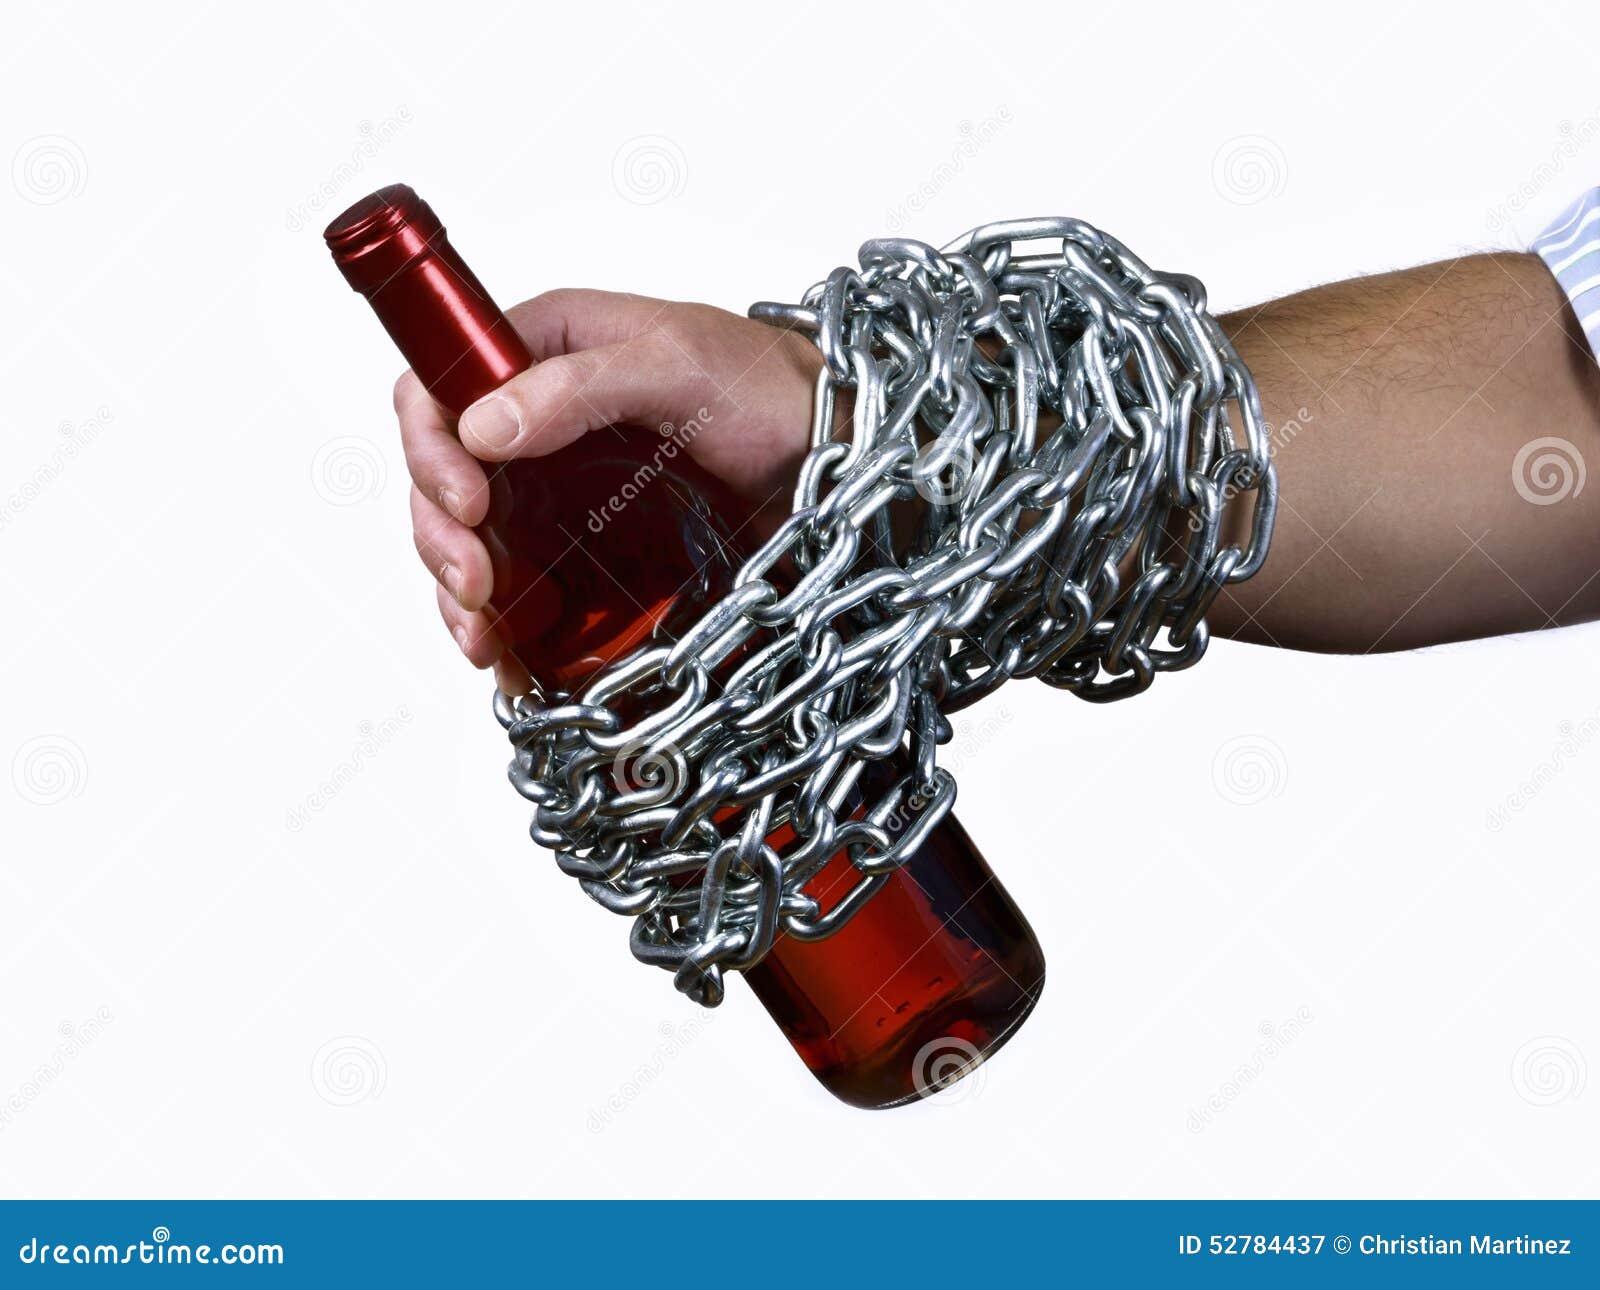 Alcohol Abuse Stock Photo - Image: 52784437